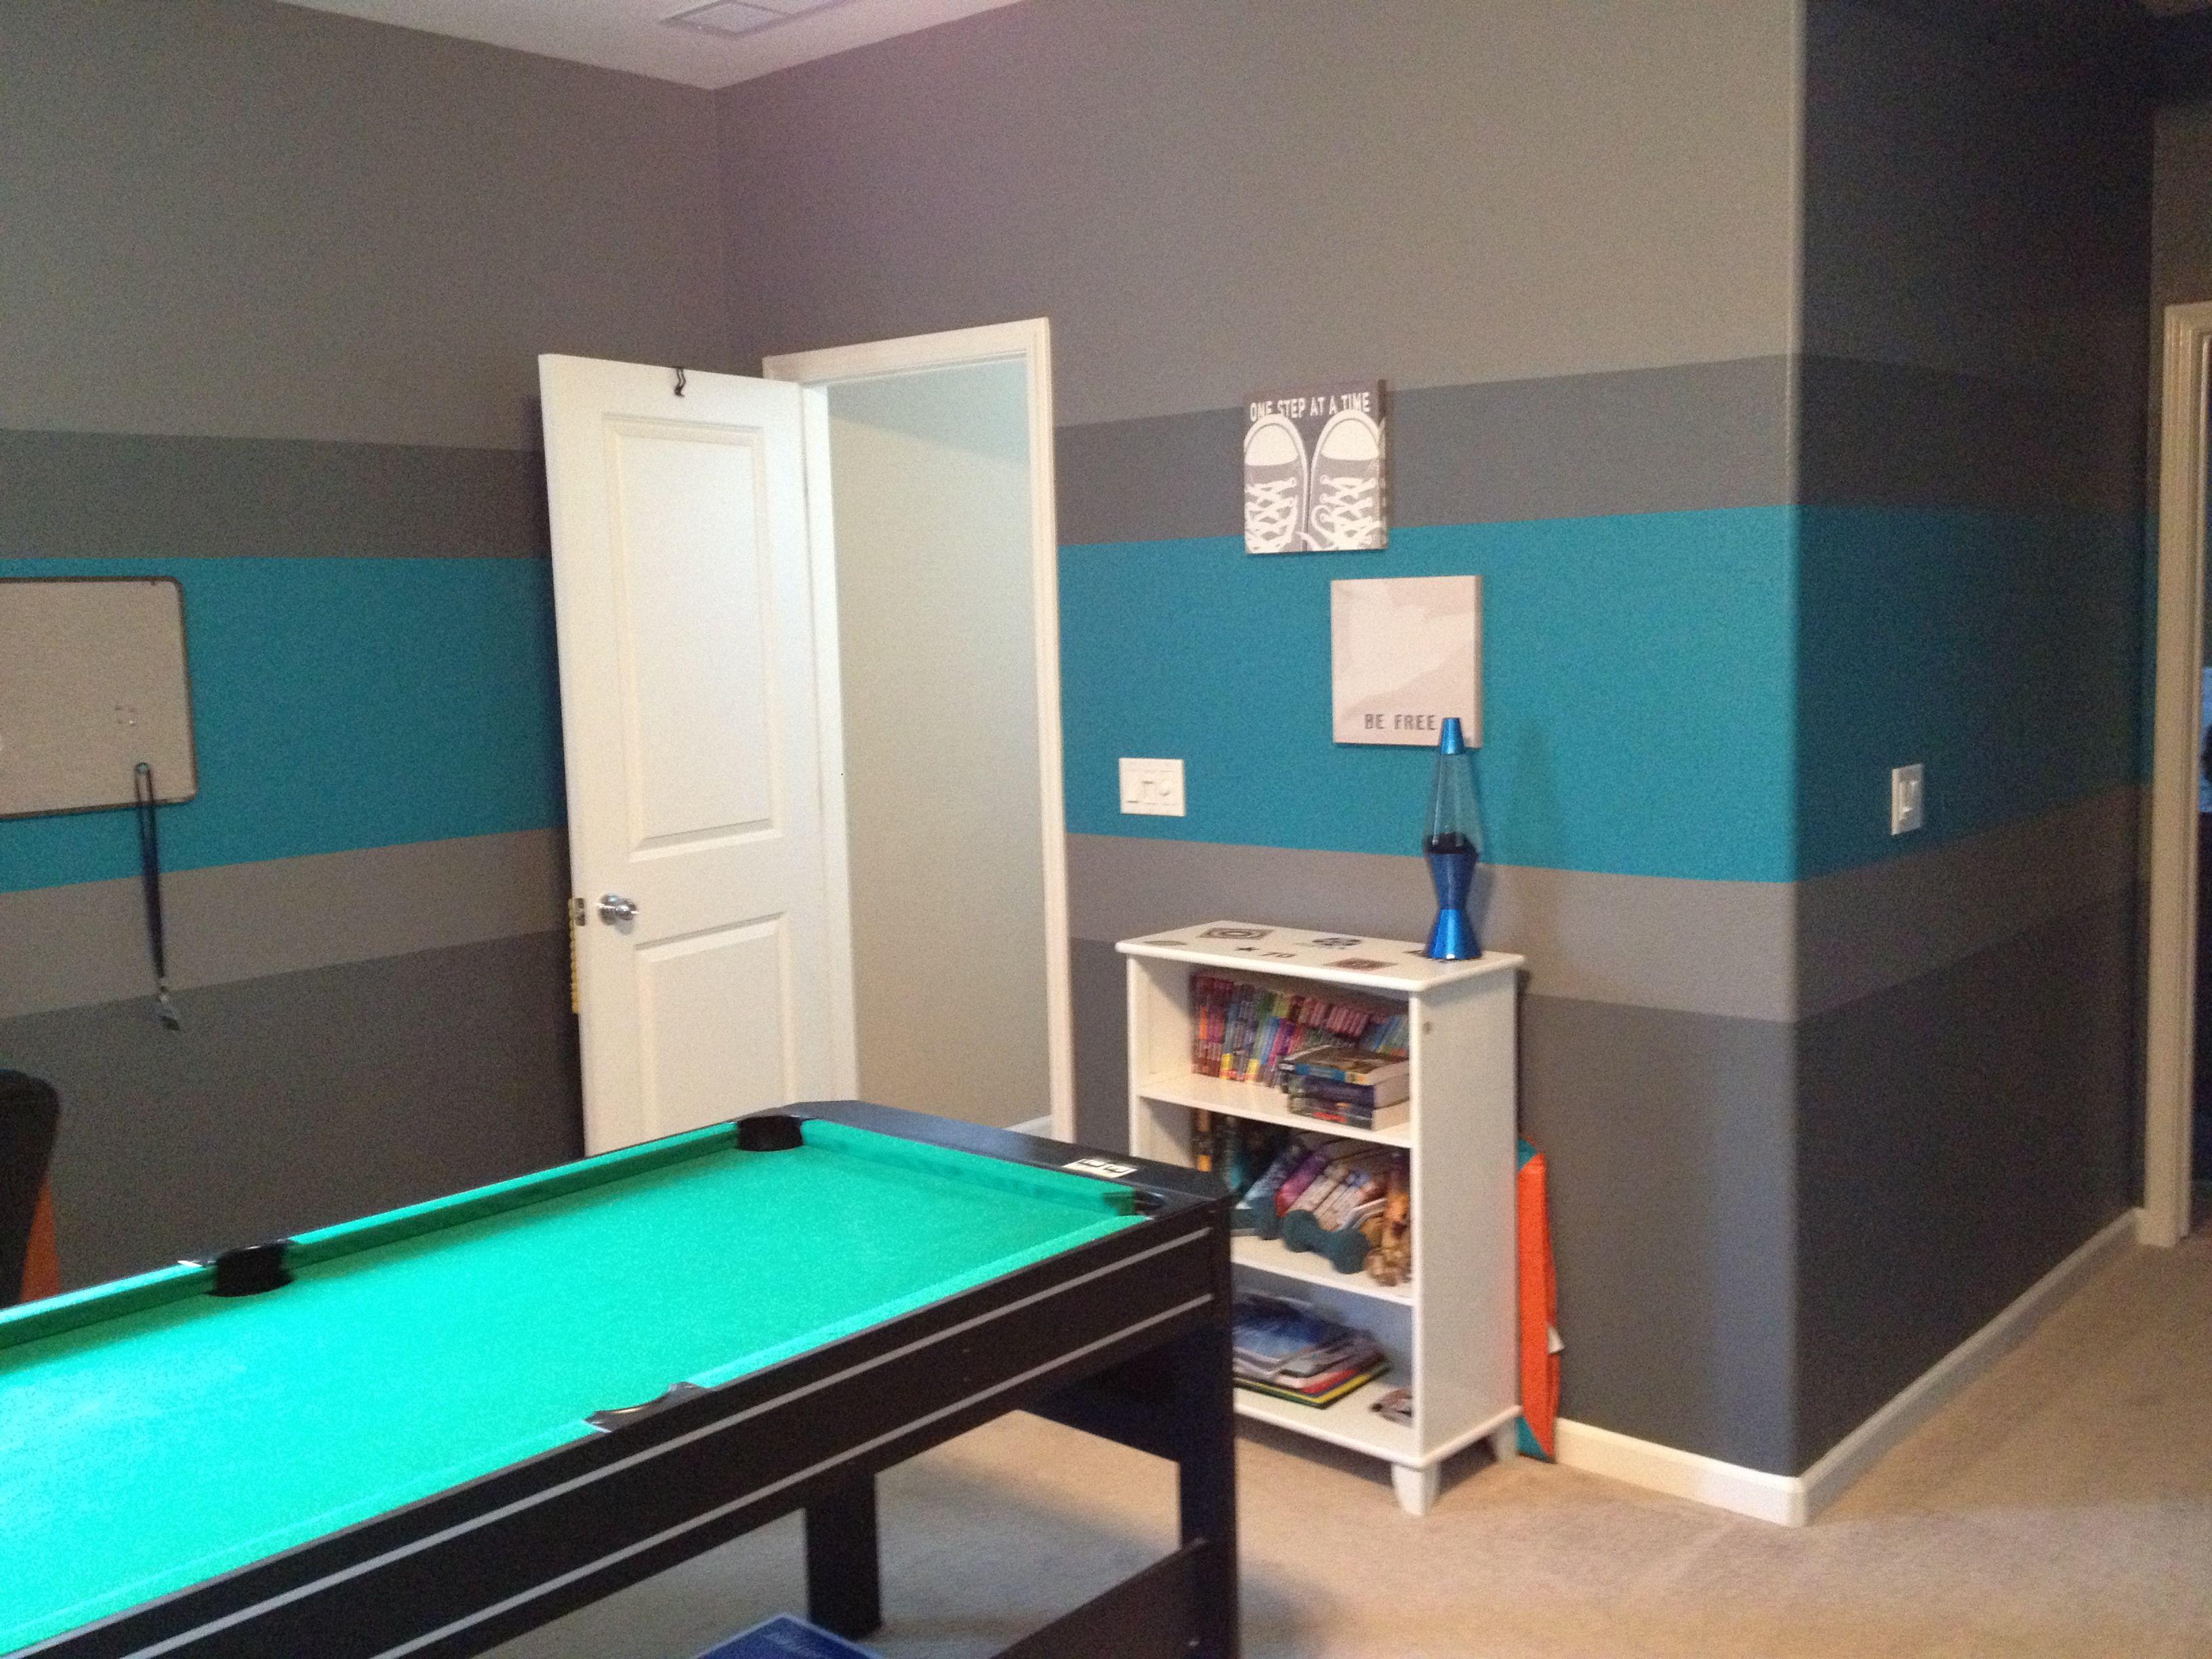 Turquoise Room Decorations, Colors of Nature & Aqua ...